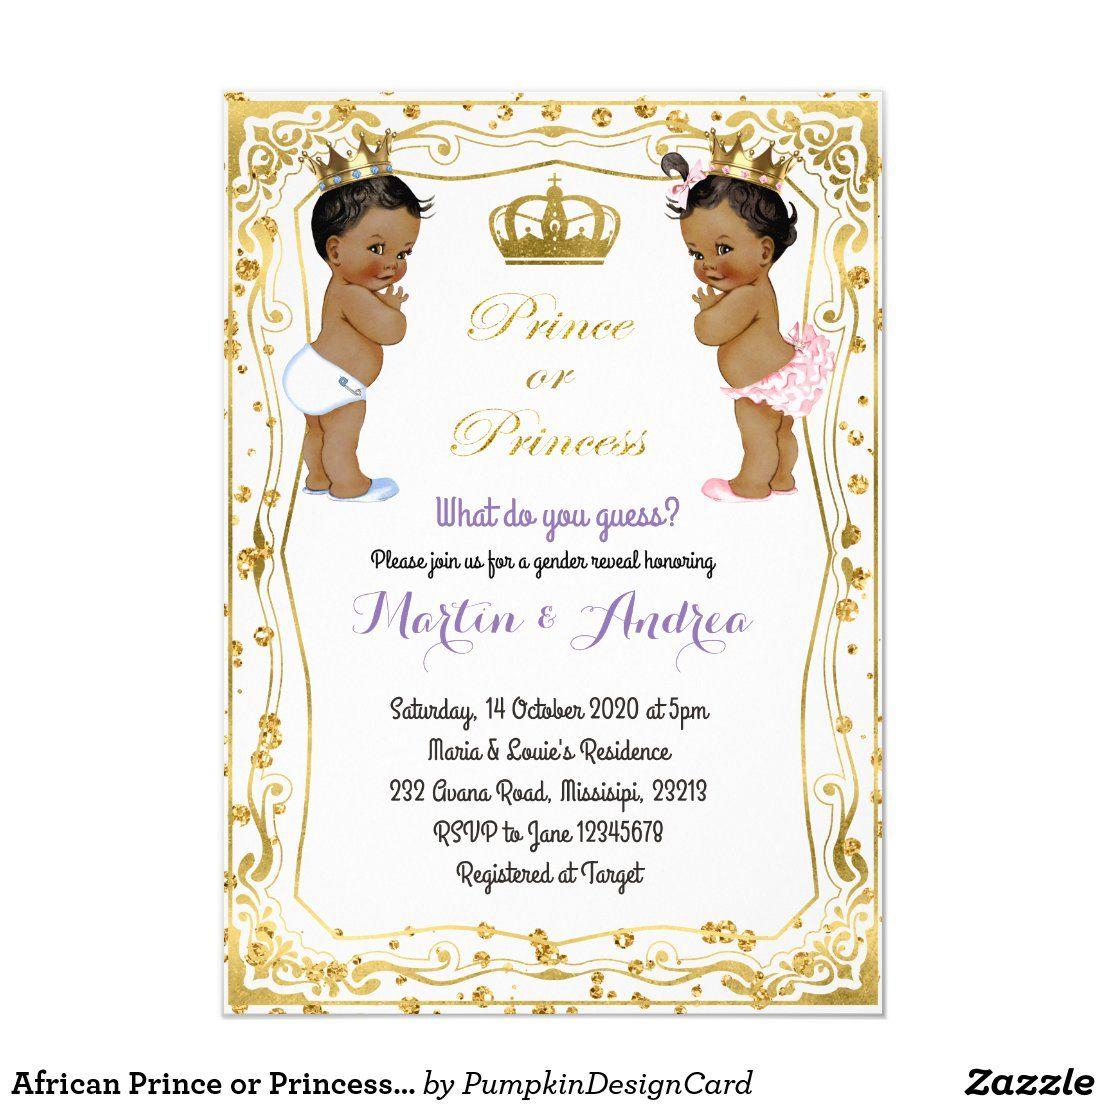 African Prince Or Princess Gender Reveal Invitation Zazzle Com Gender Reveal Invitations Gender Reveal Reveal